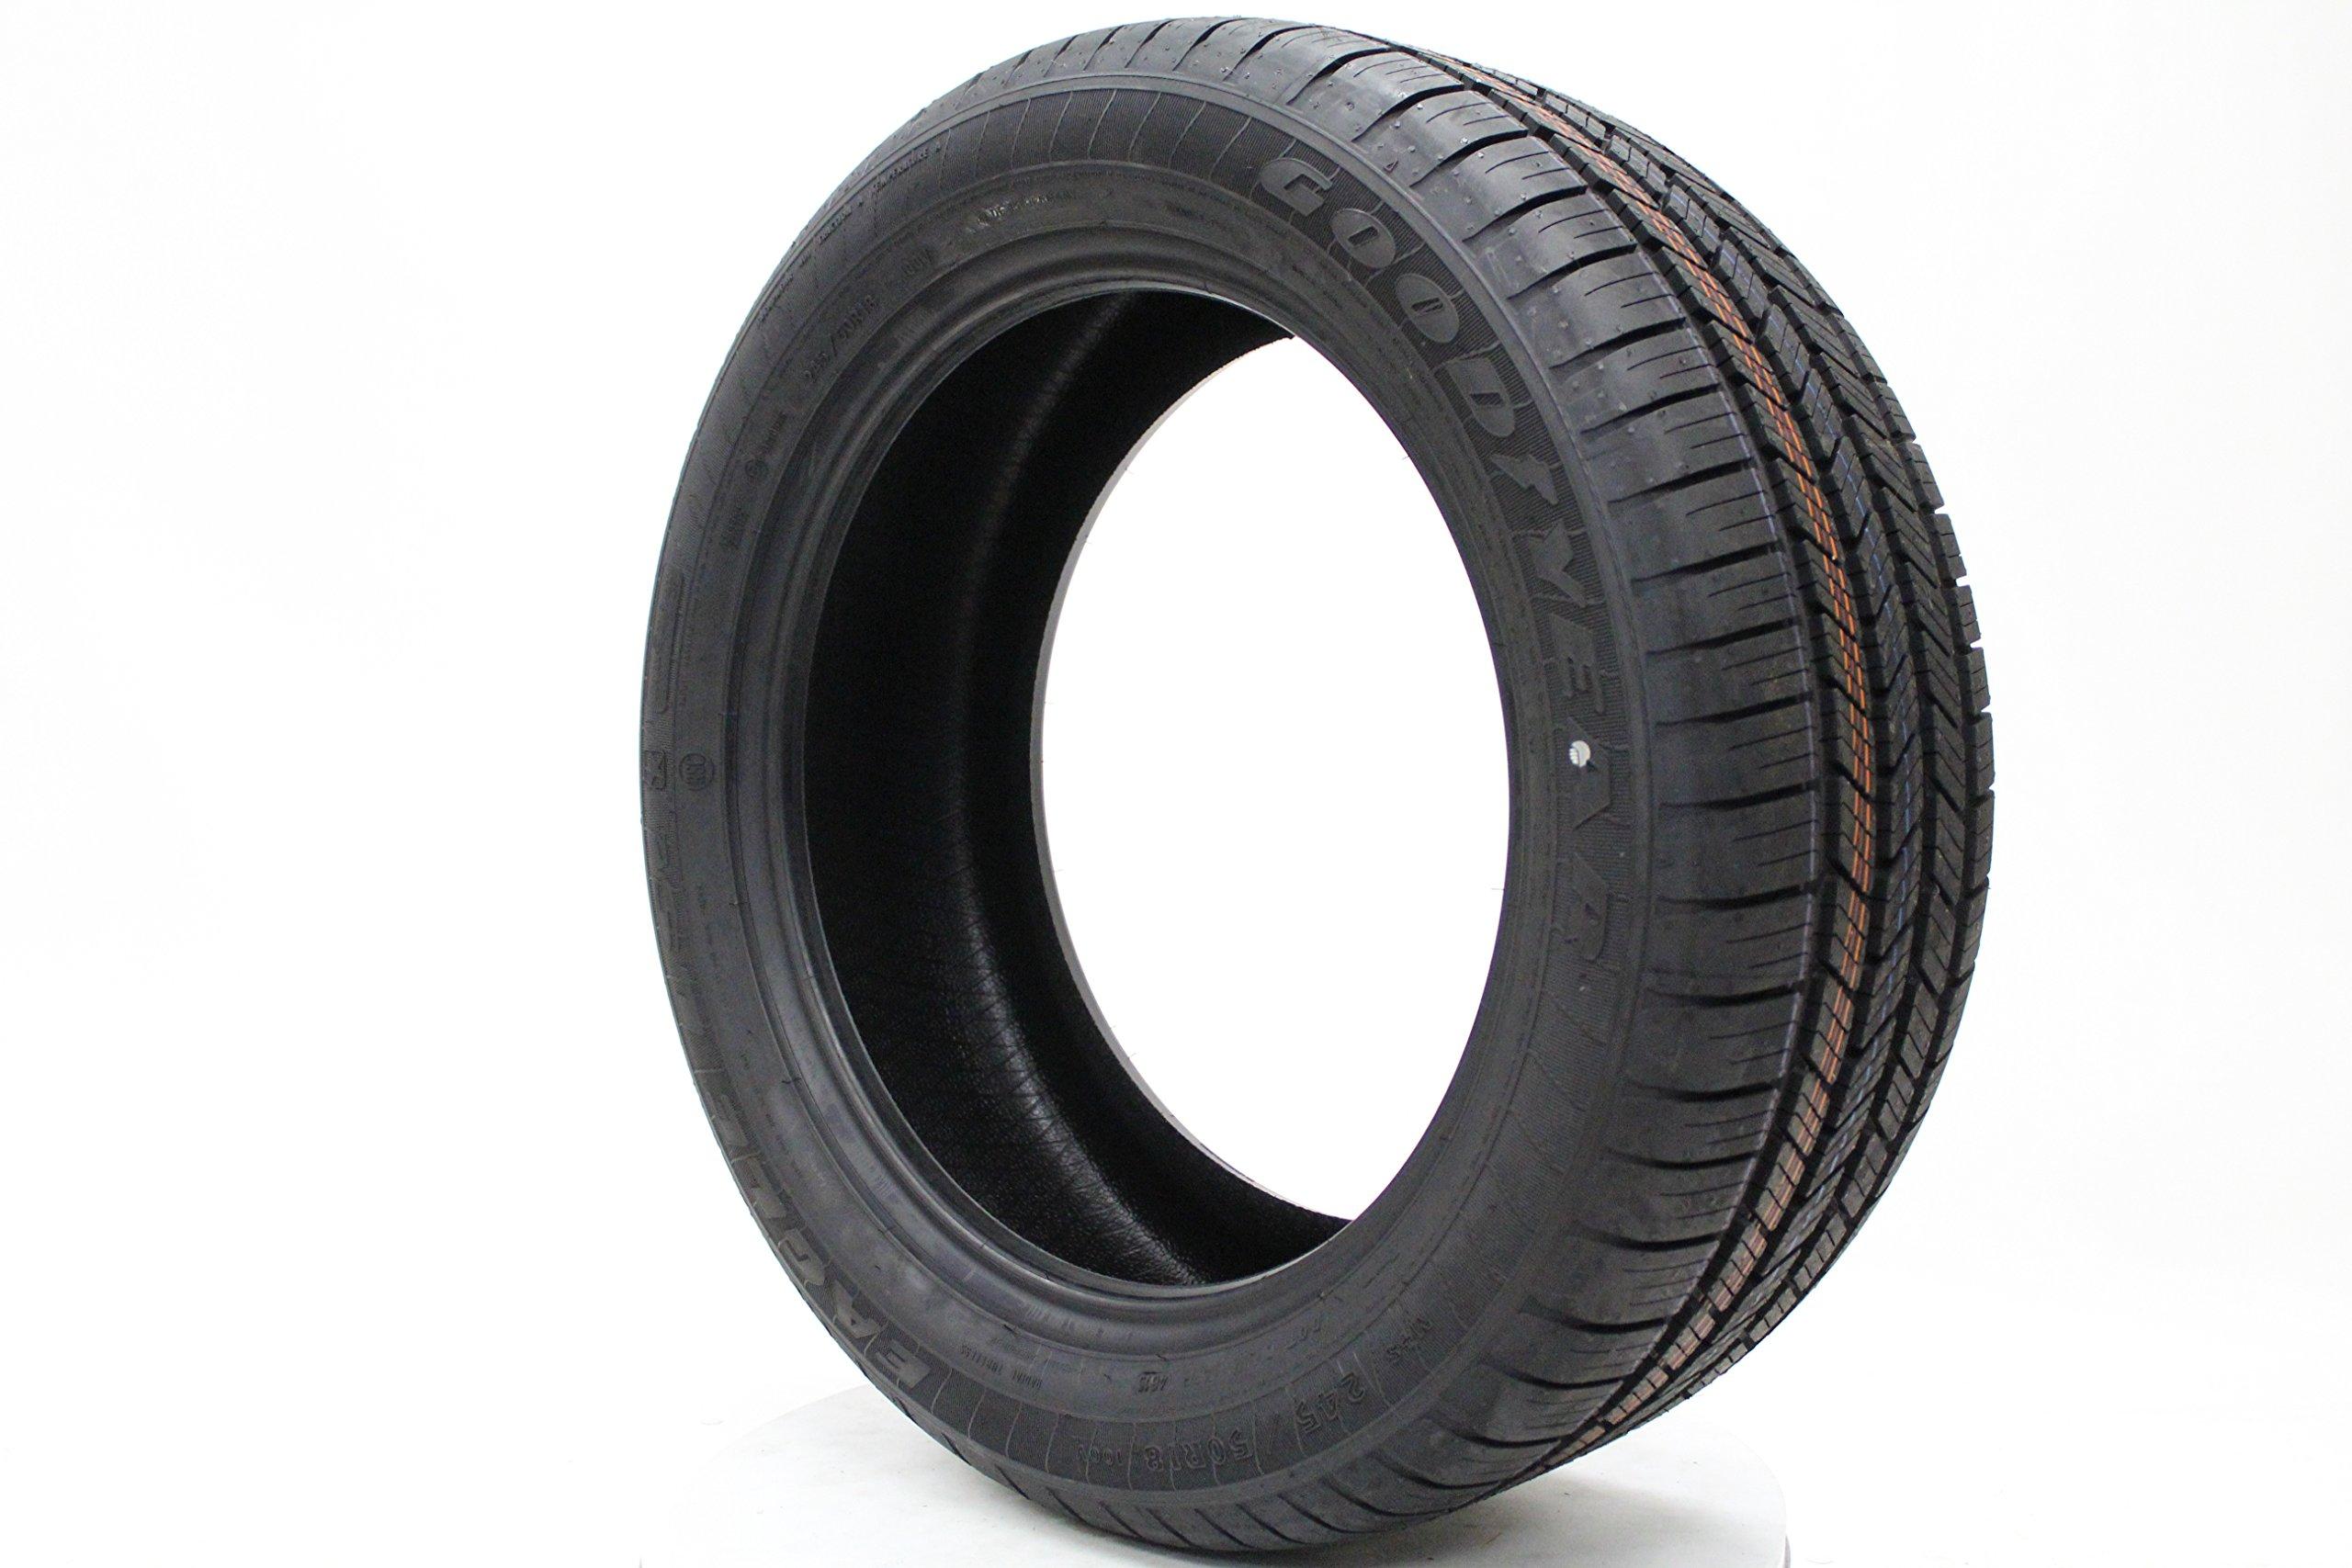 Goodyear Eagle LS2 ROF All-Season Radial Tire – 245/45R19 102V